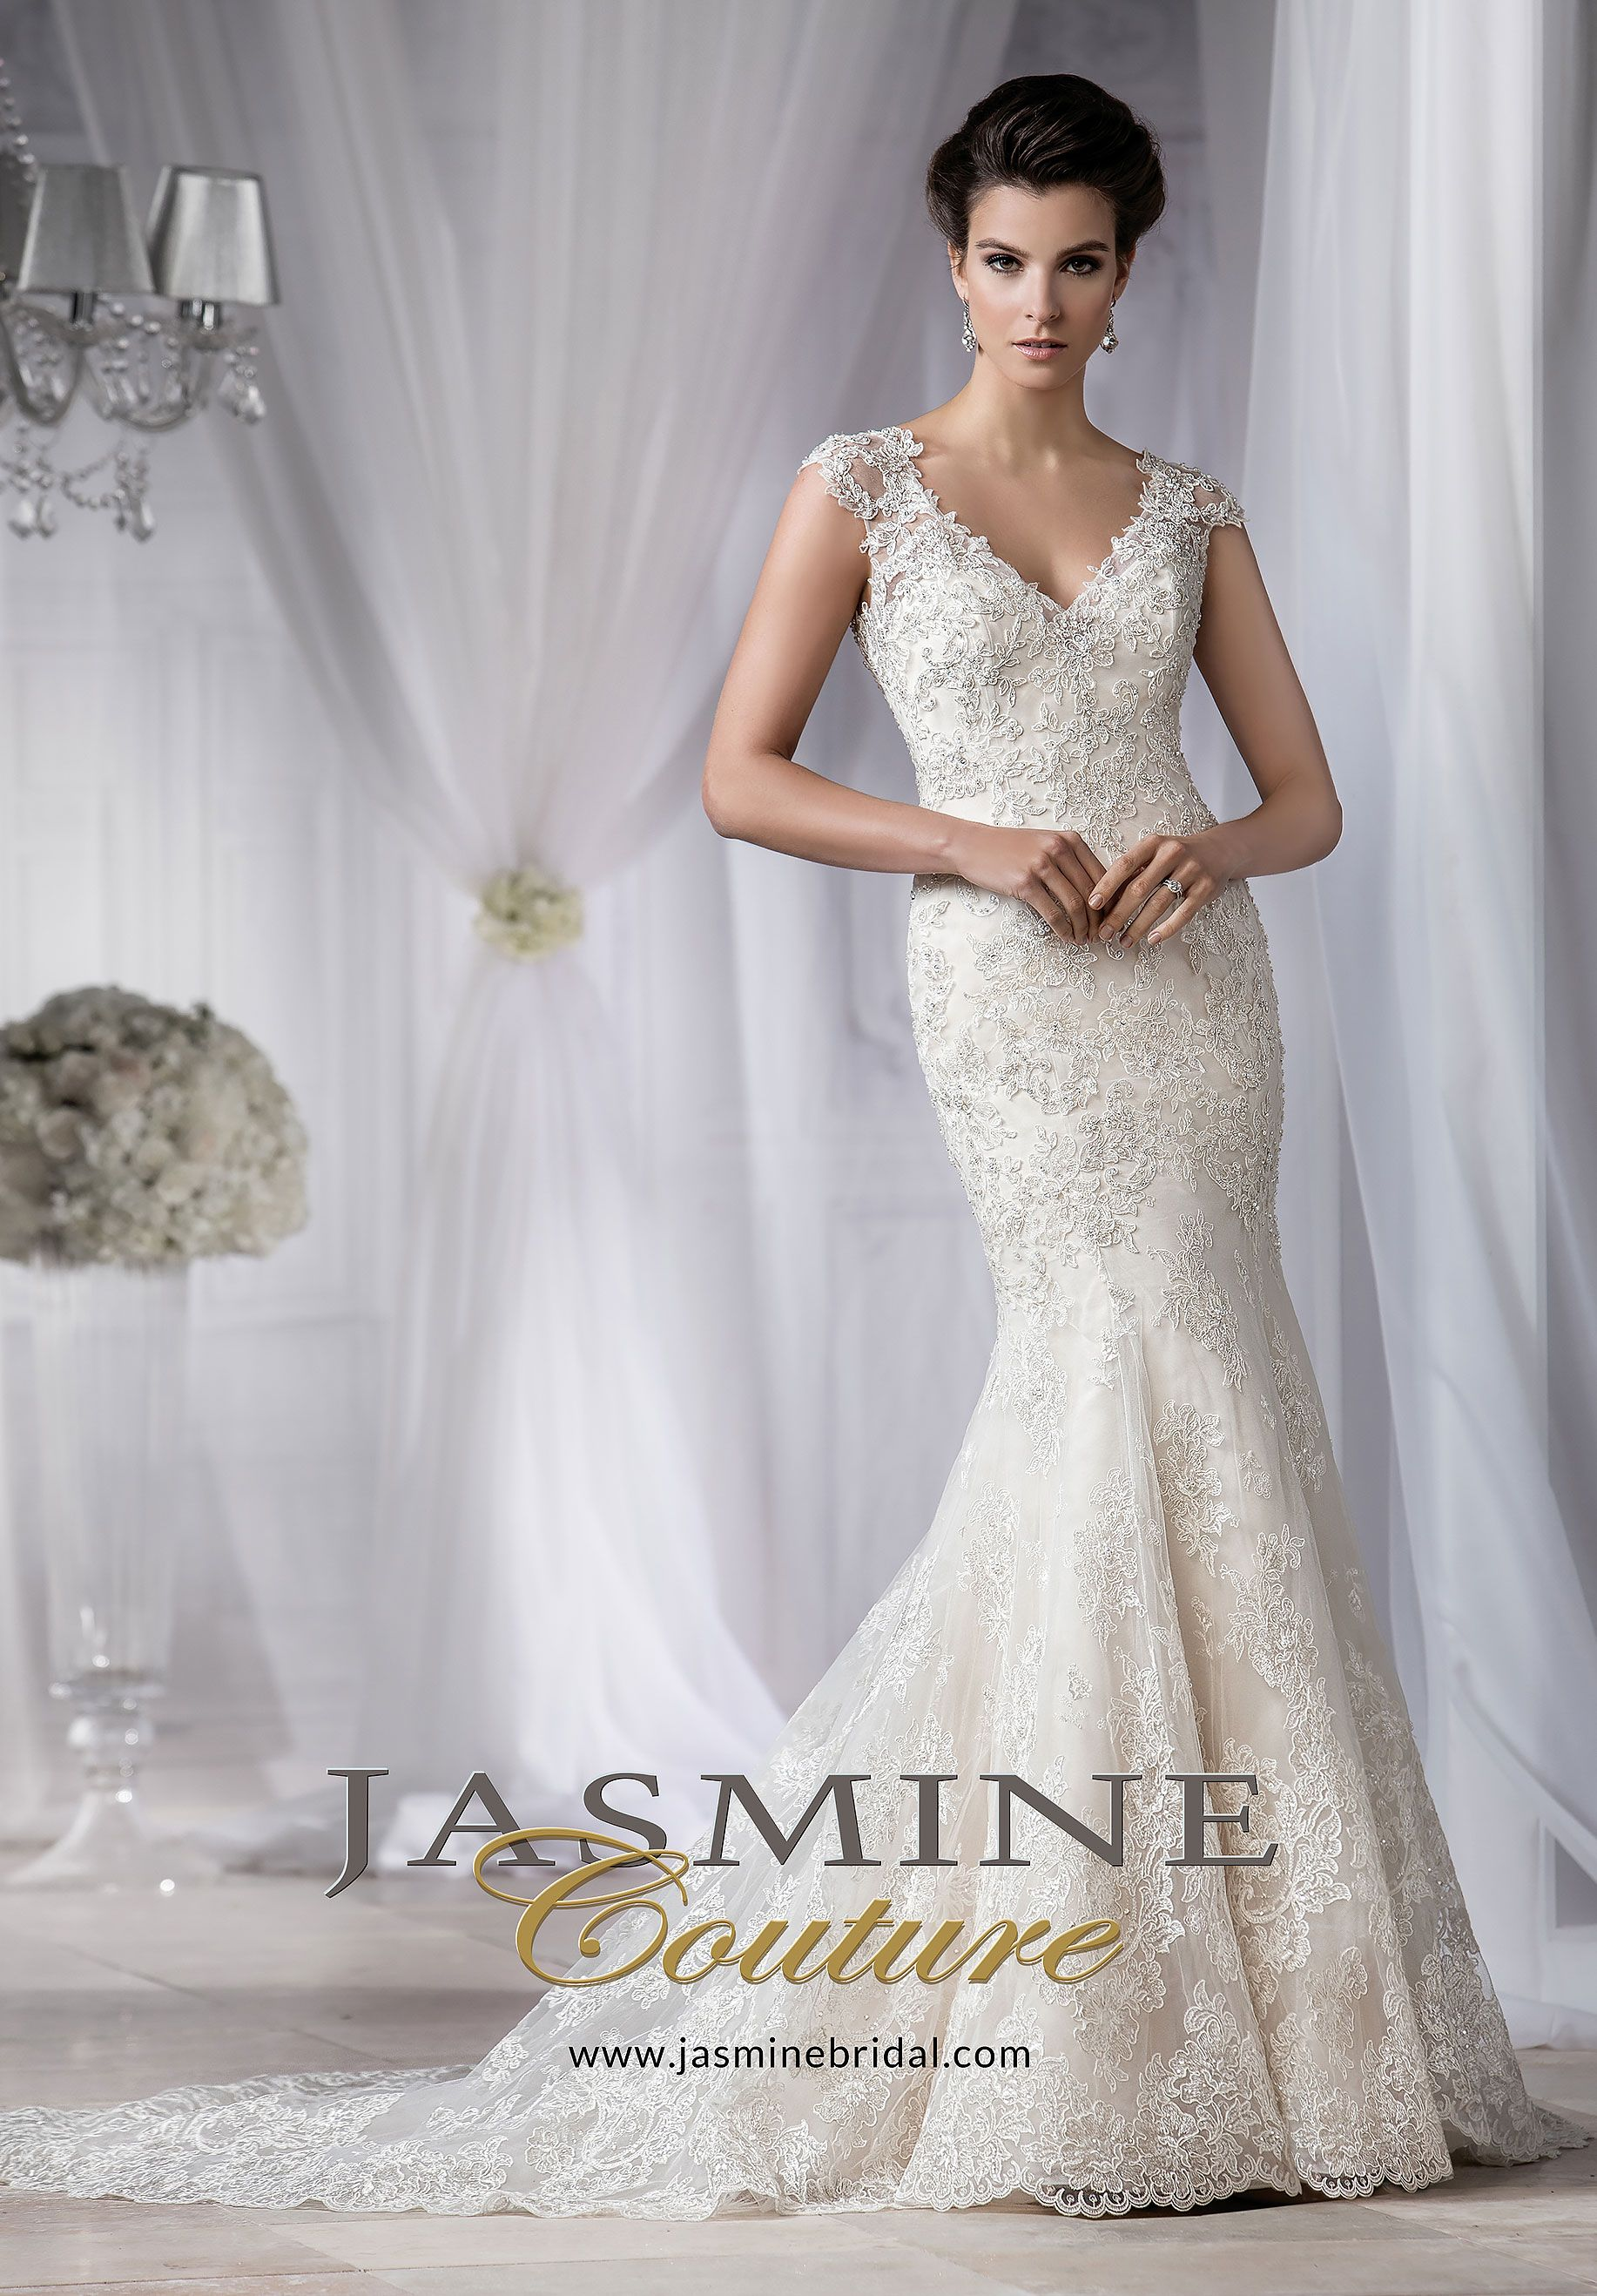 Bridal Gallery of Orlando | bridal gallery-orlando | Pinterest | Jasmine